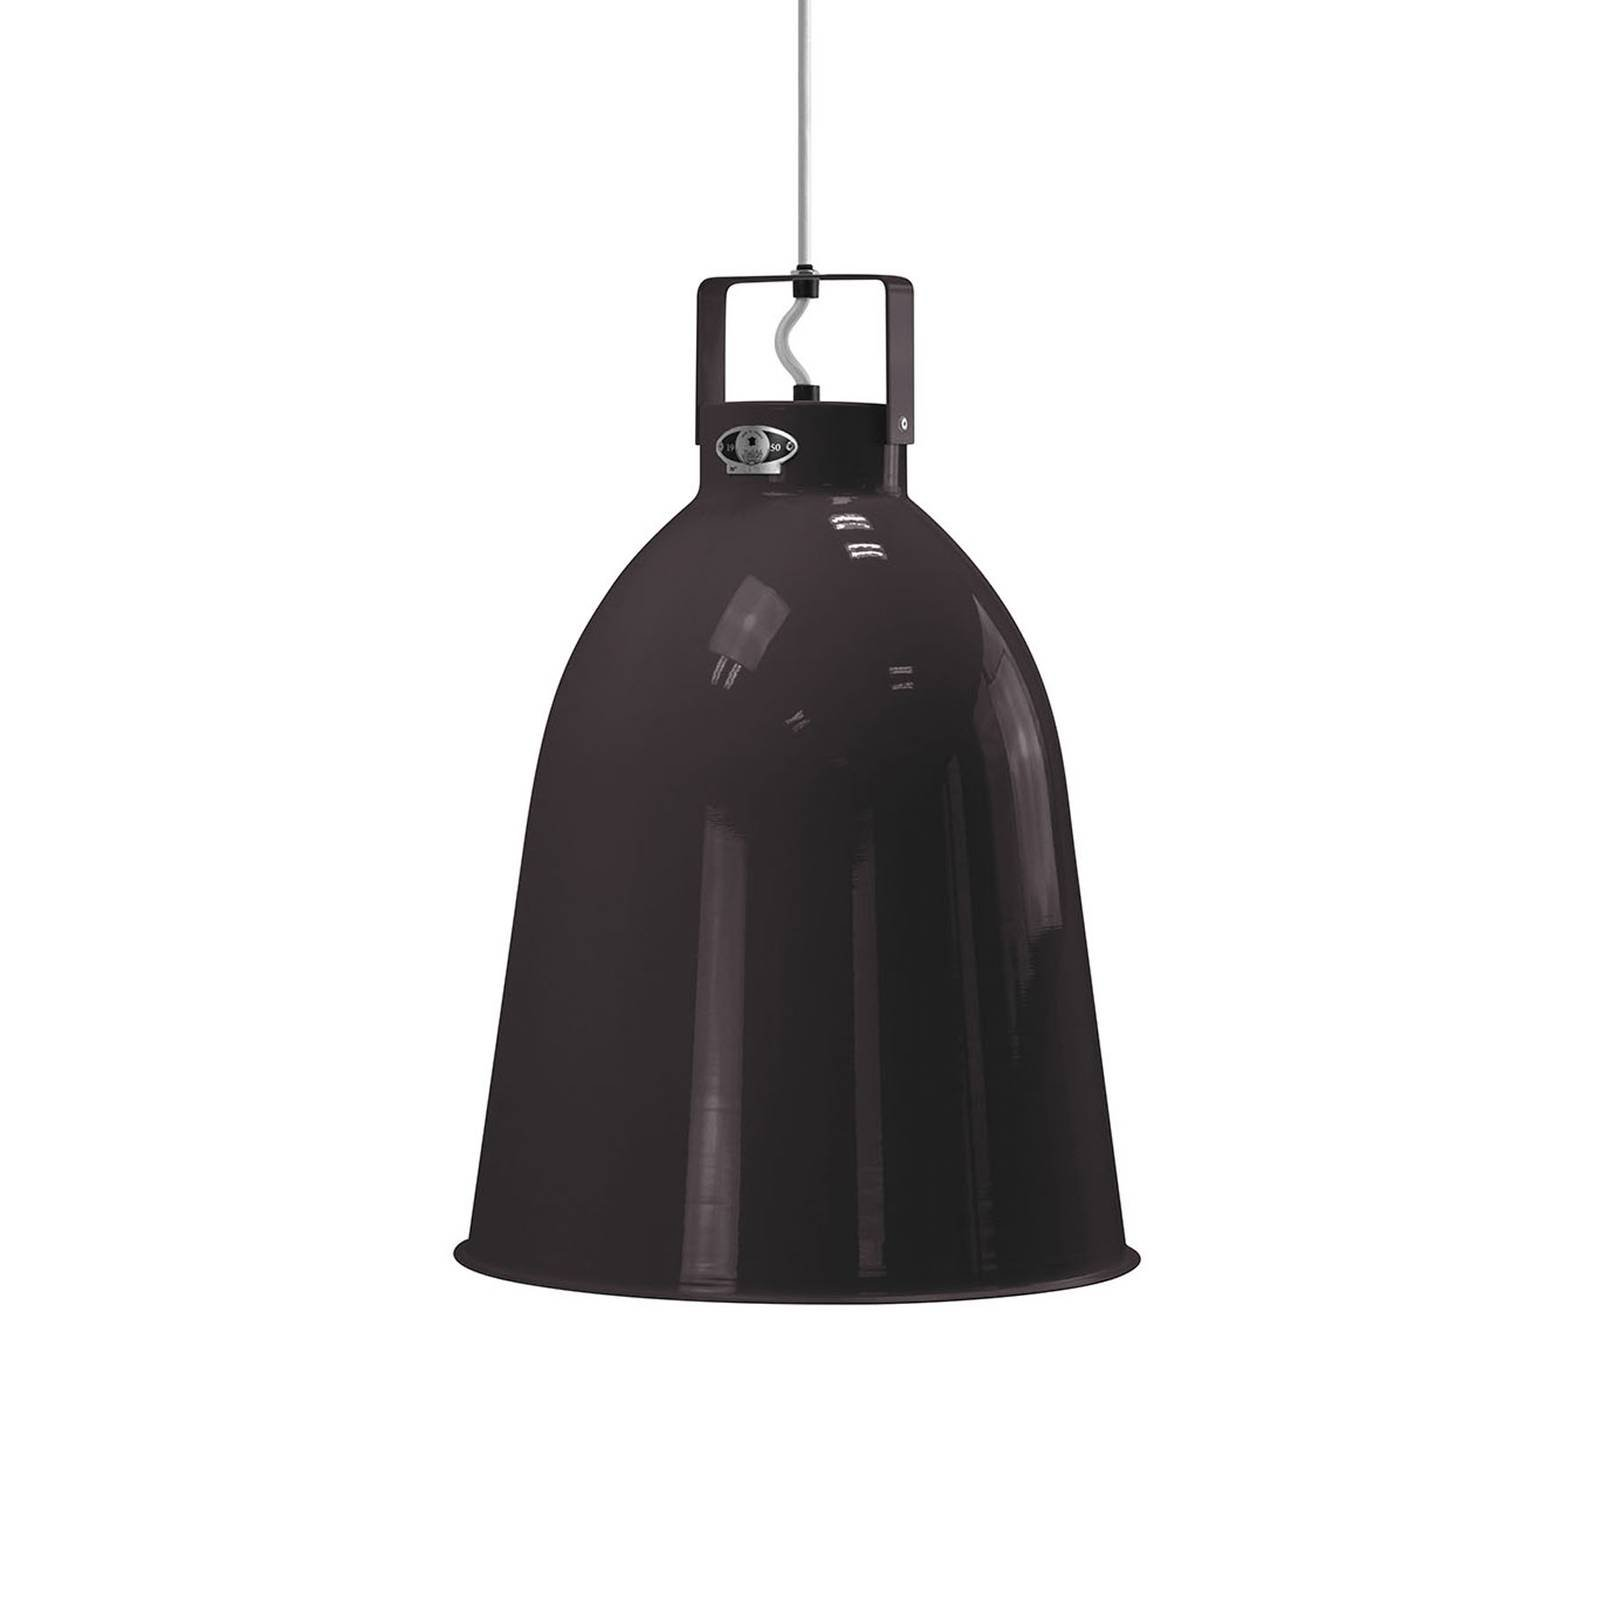 Jieldé Clément C360 hengelampe, blank svart, Ø36cm